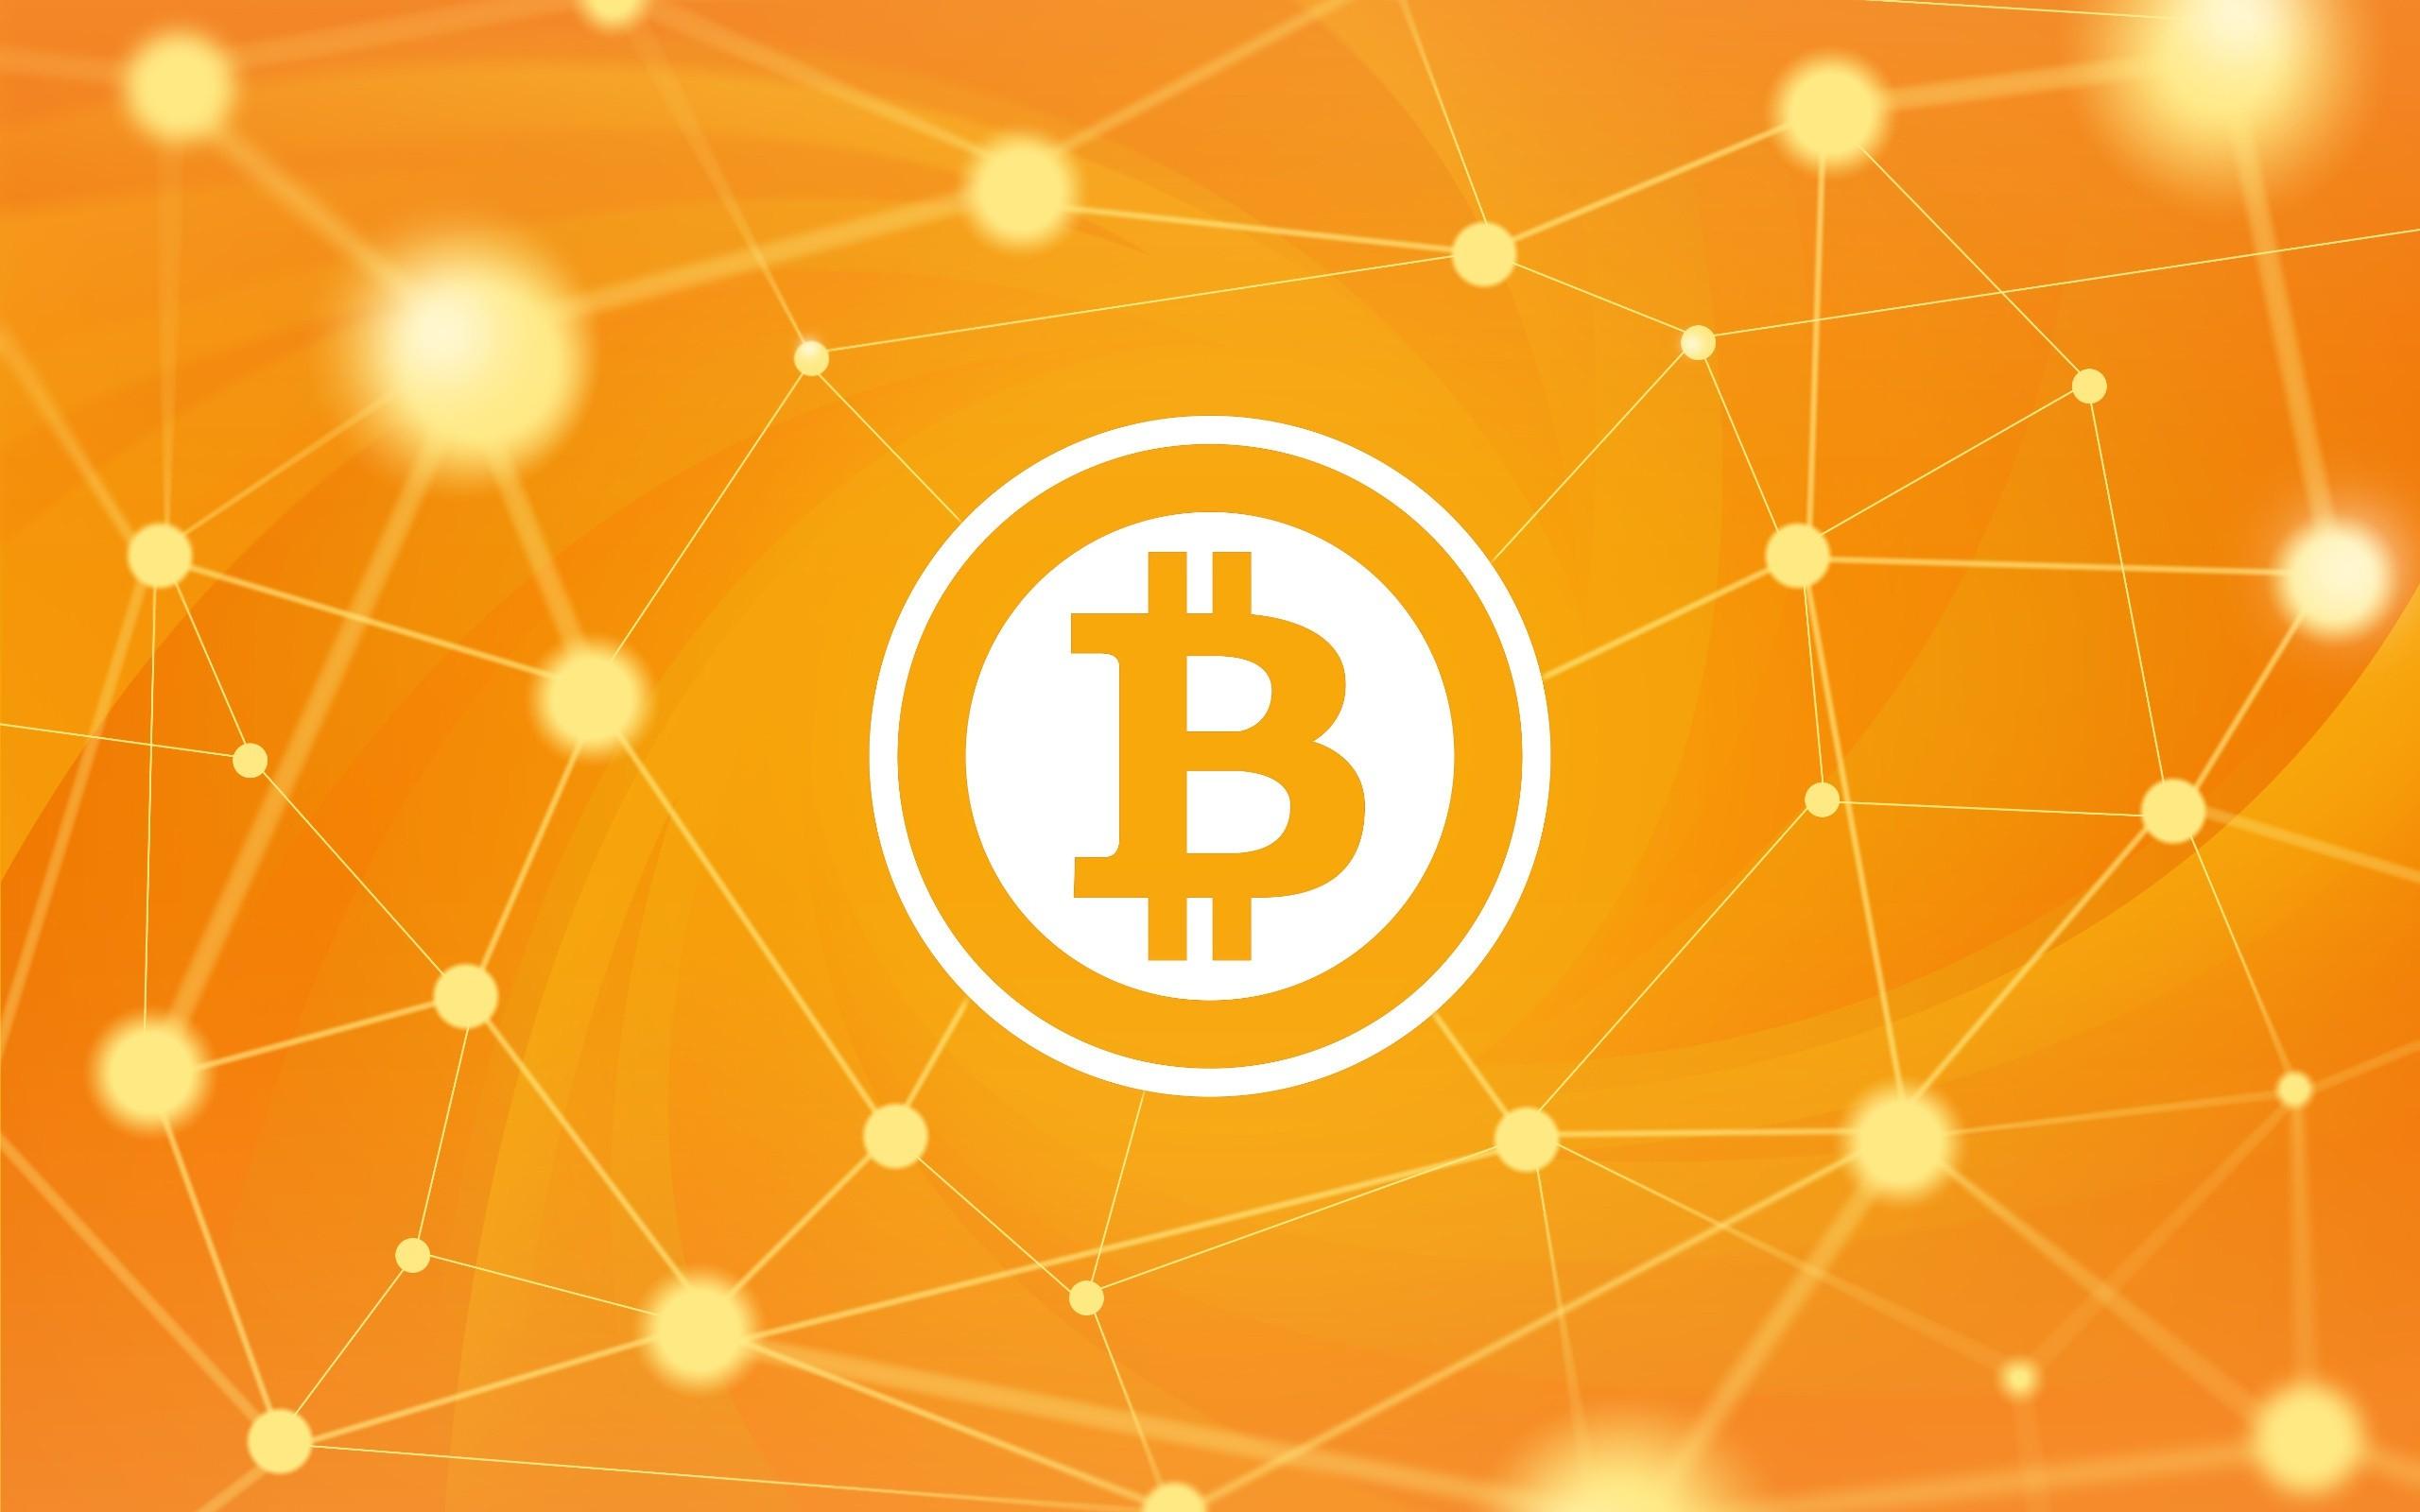 Крипто-новости от FxPro